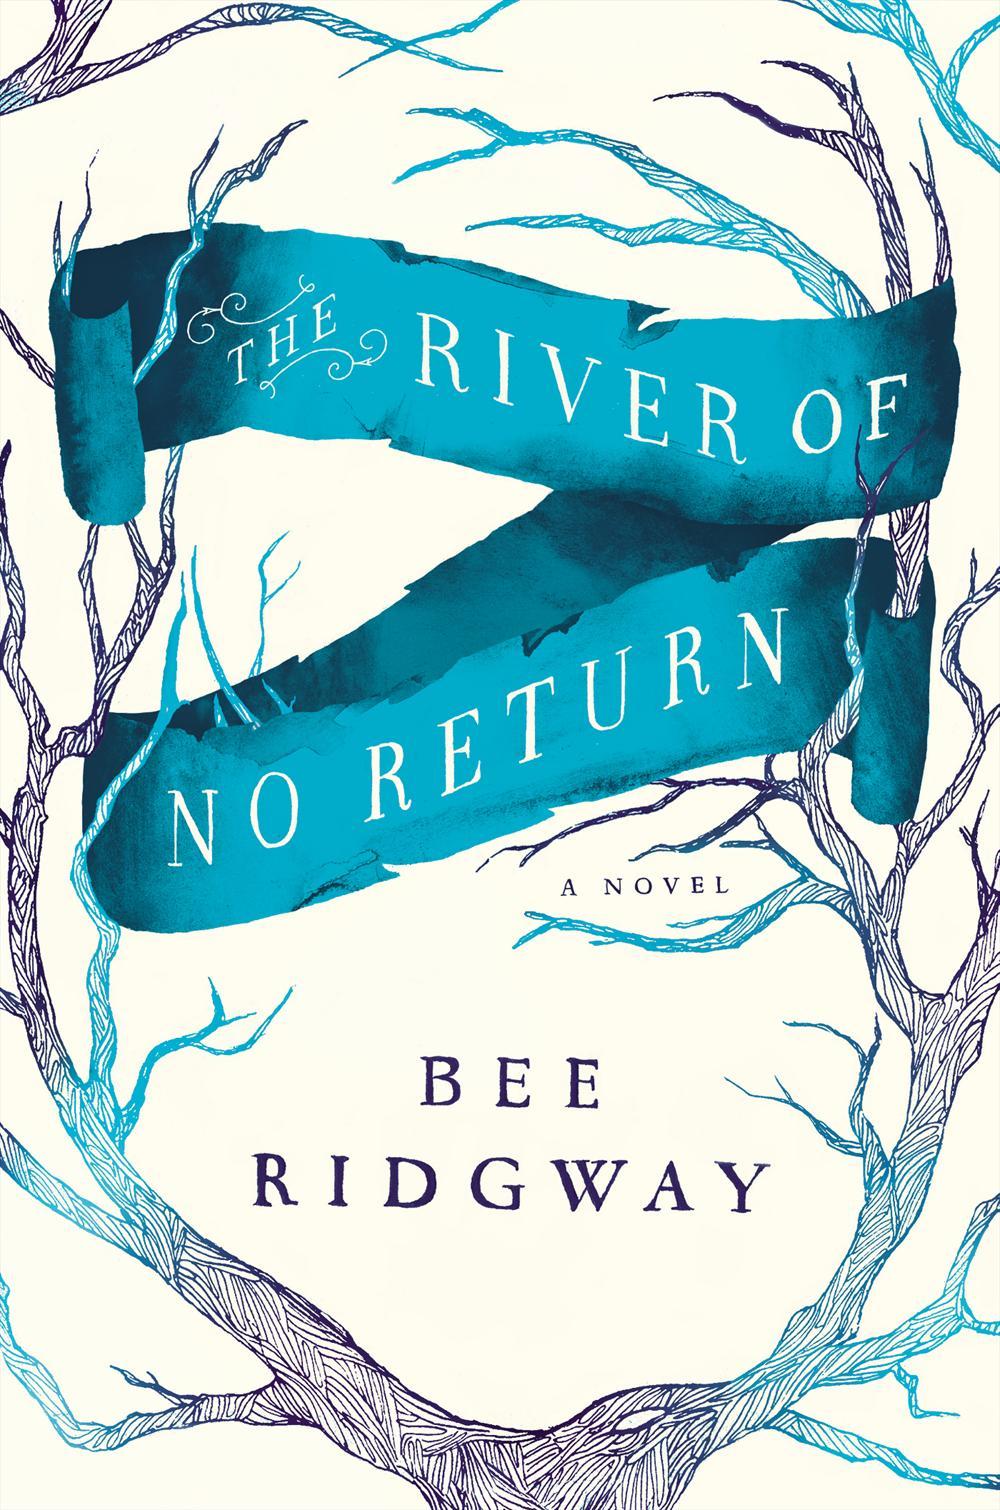 River of no return cover